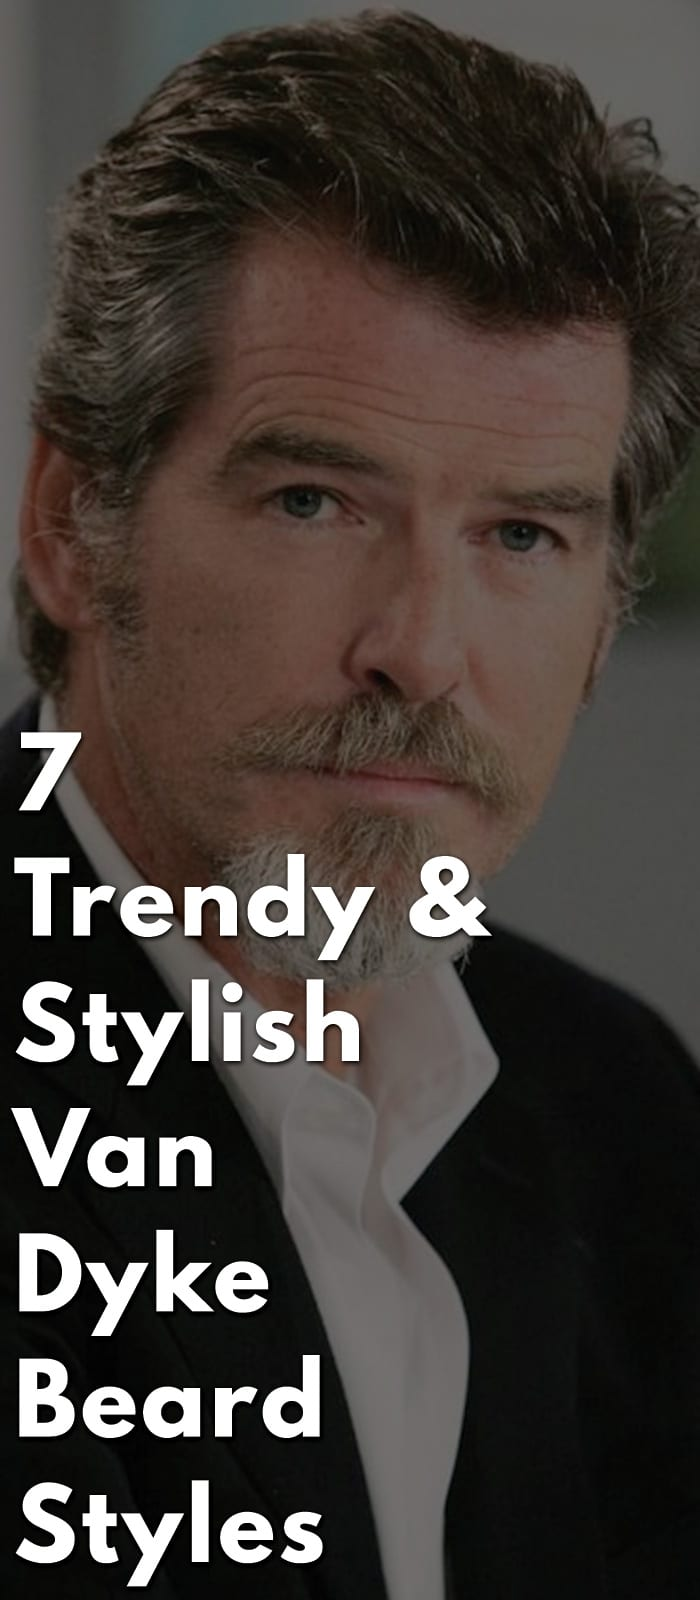 7-Trendy-&-Stylish-Van-Dyke-Beard-Styles